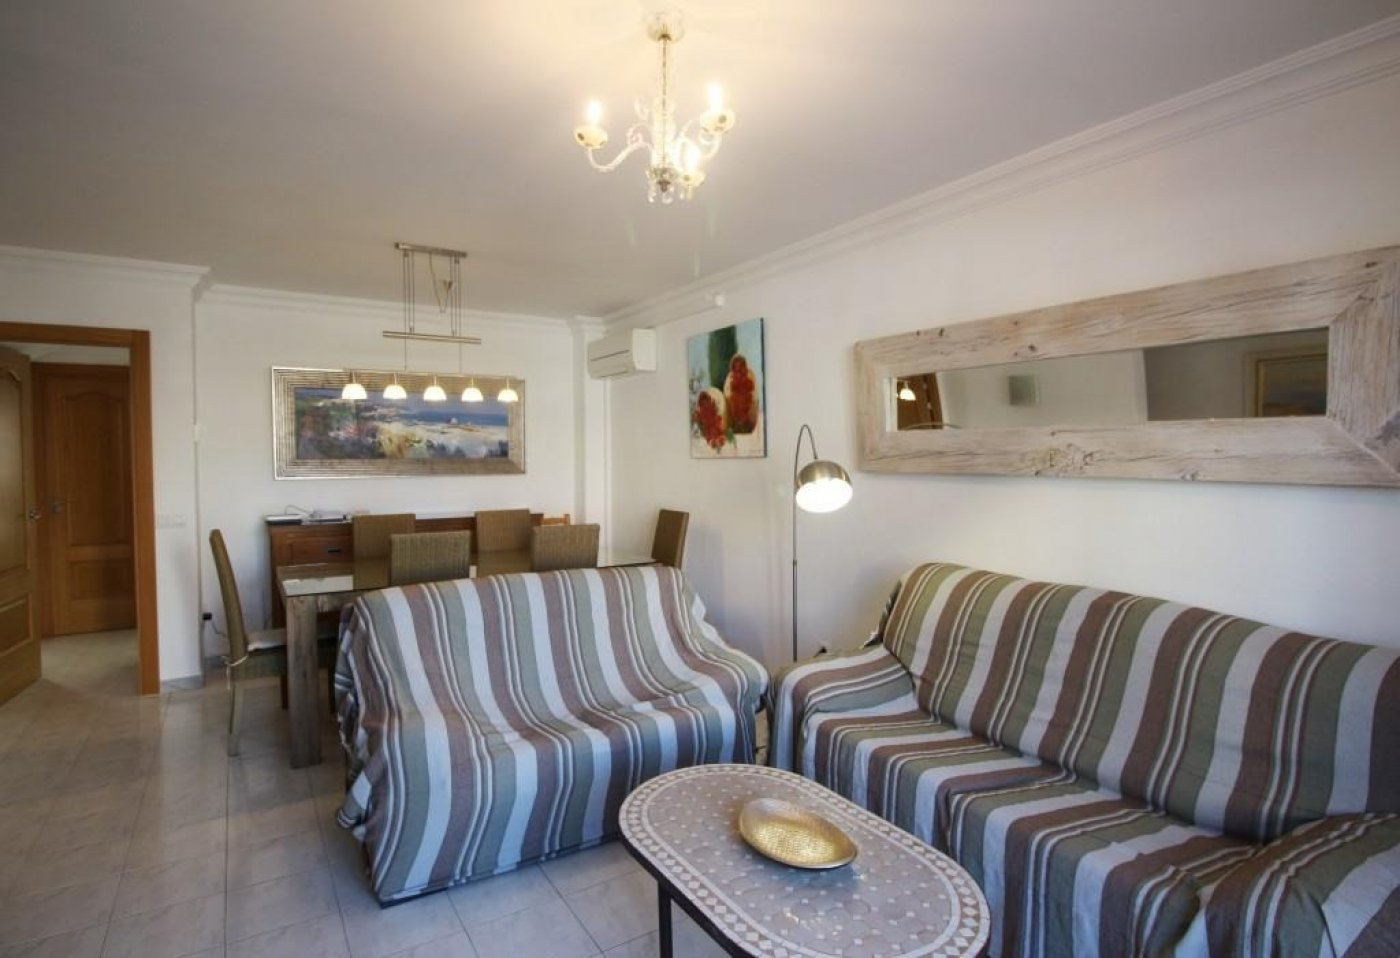 house en colonia-de-sant-jordi · colonia-de-sant-jordi 0€